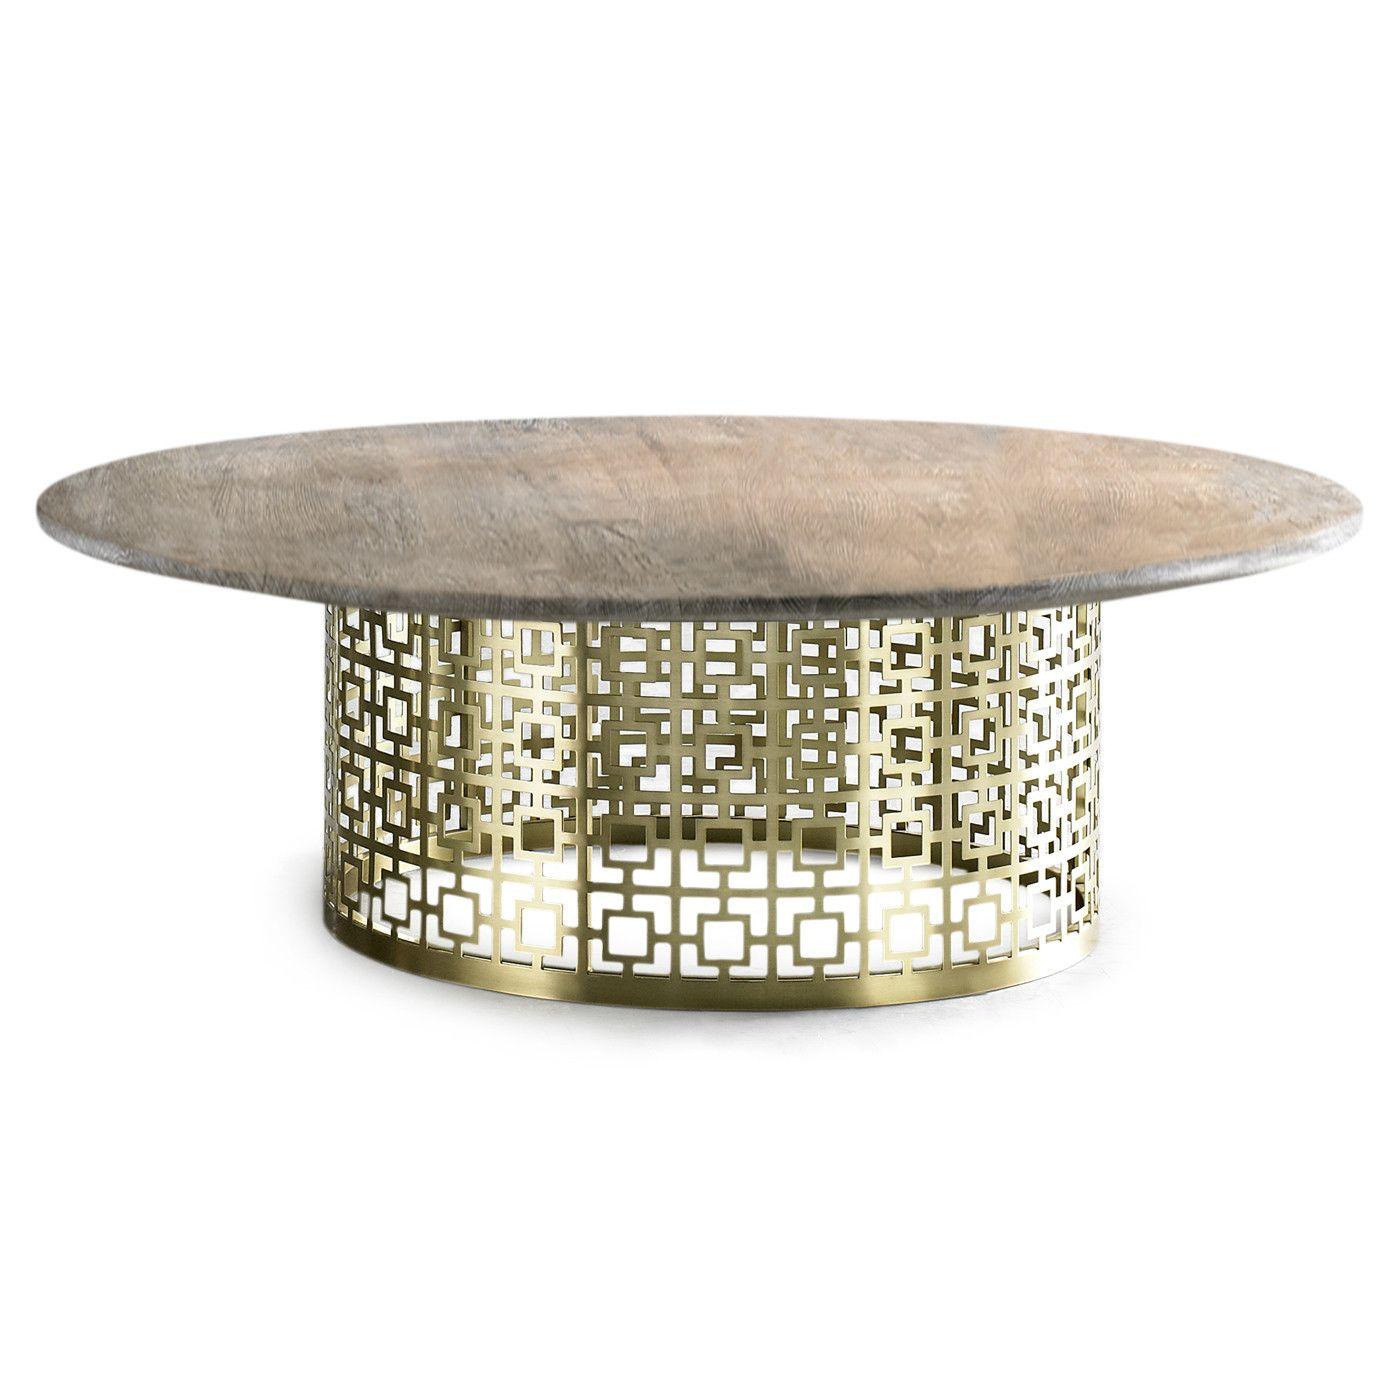 Nixon Coffee Table Round Coffee Table Modern Coffee Table Round Coffee Table [ 1400 x 1400 Pixel ]